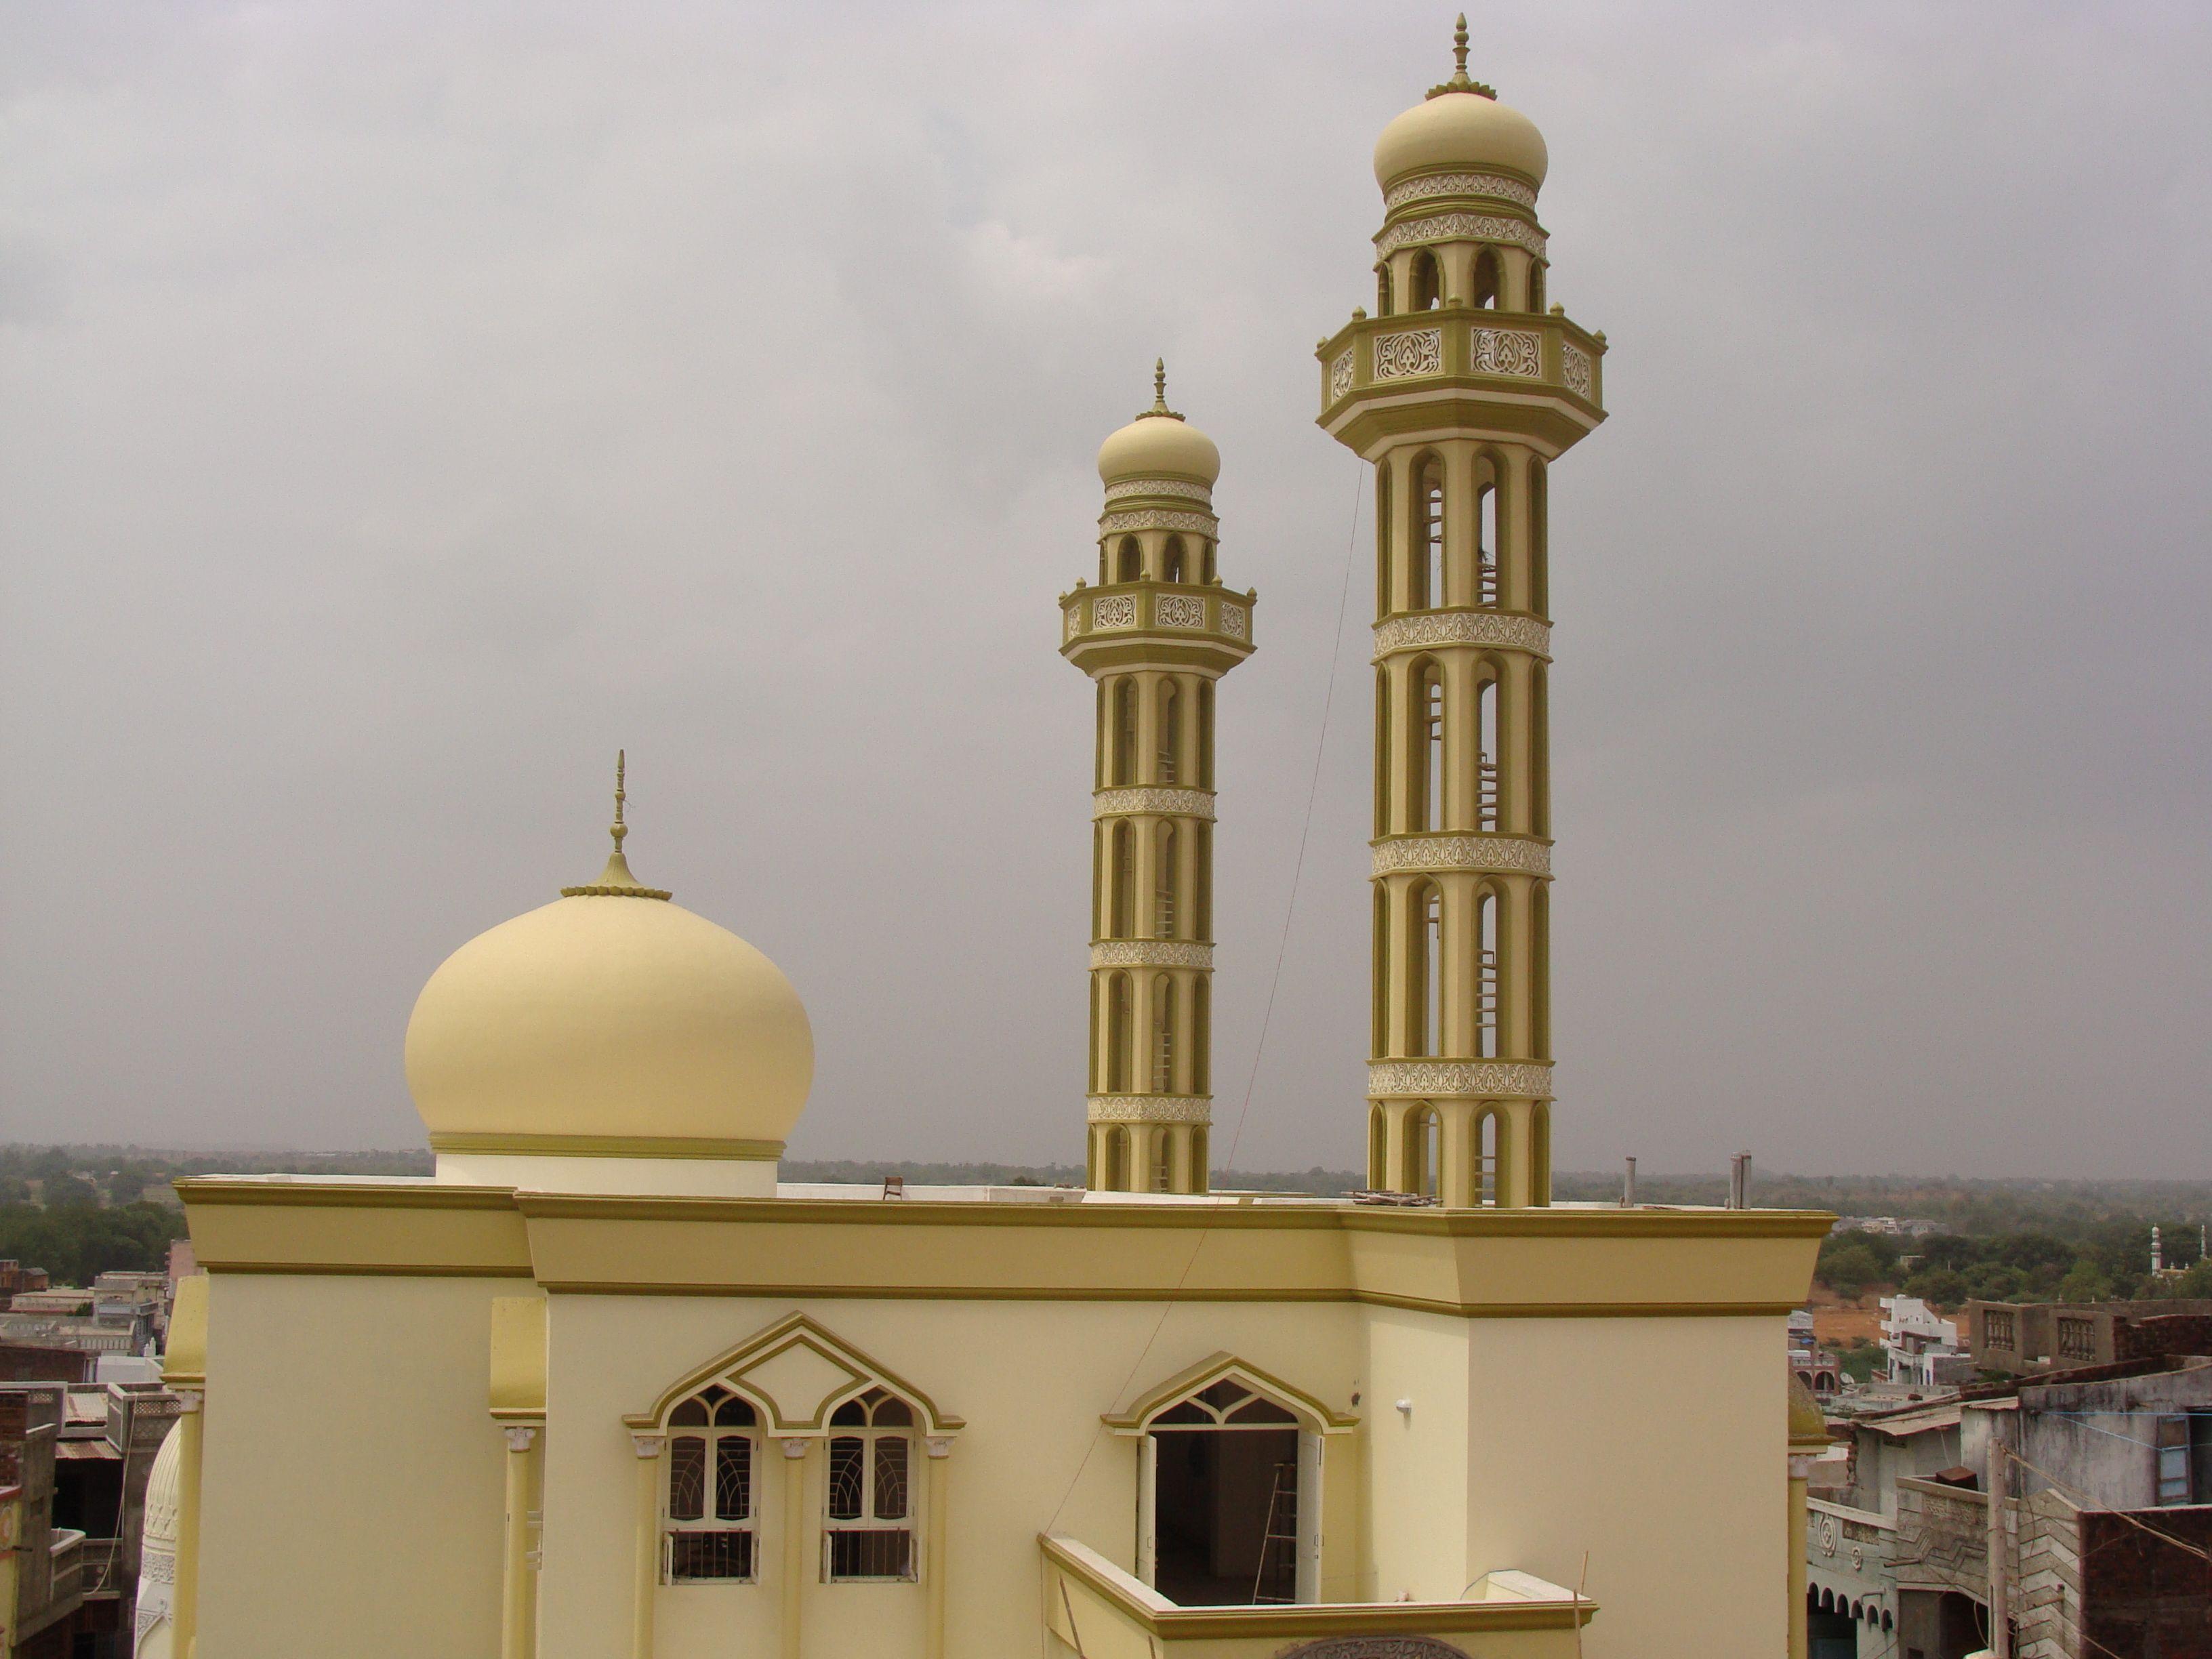 mosque elevation in my work  ideas elevation  pinterest  mosque. mosque elevation in my work